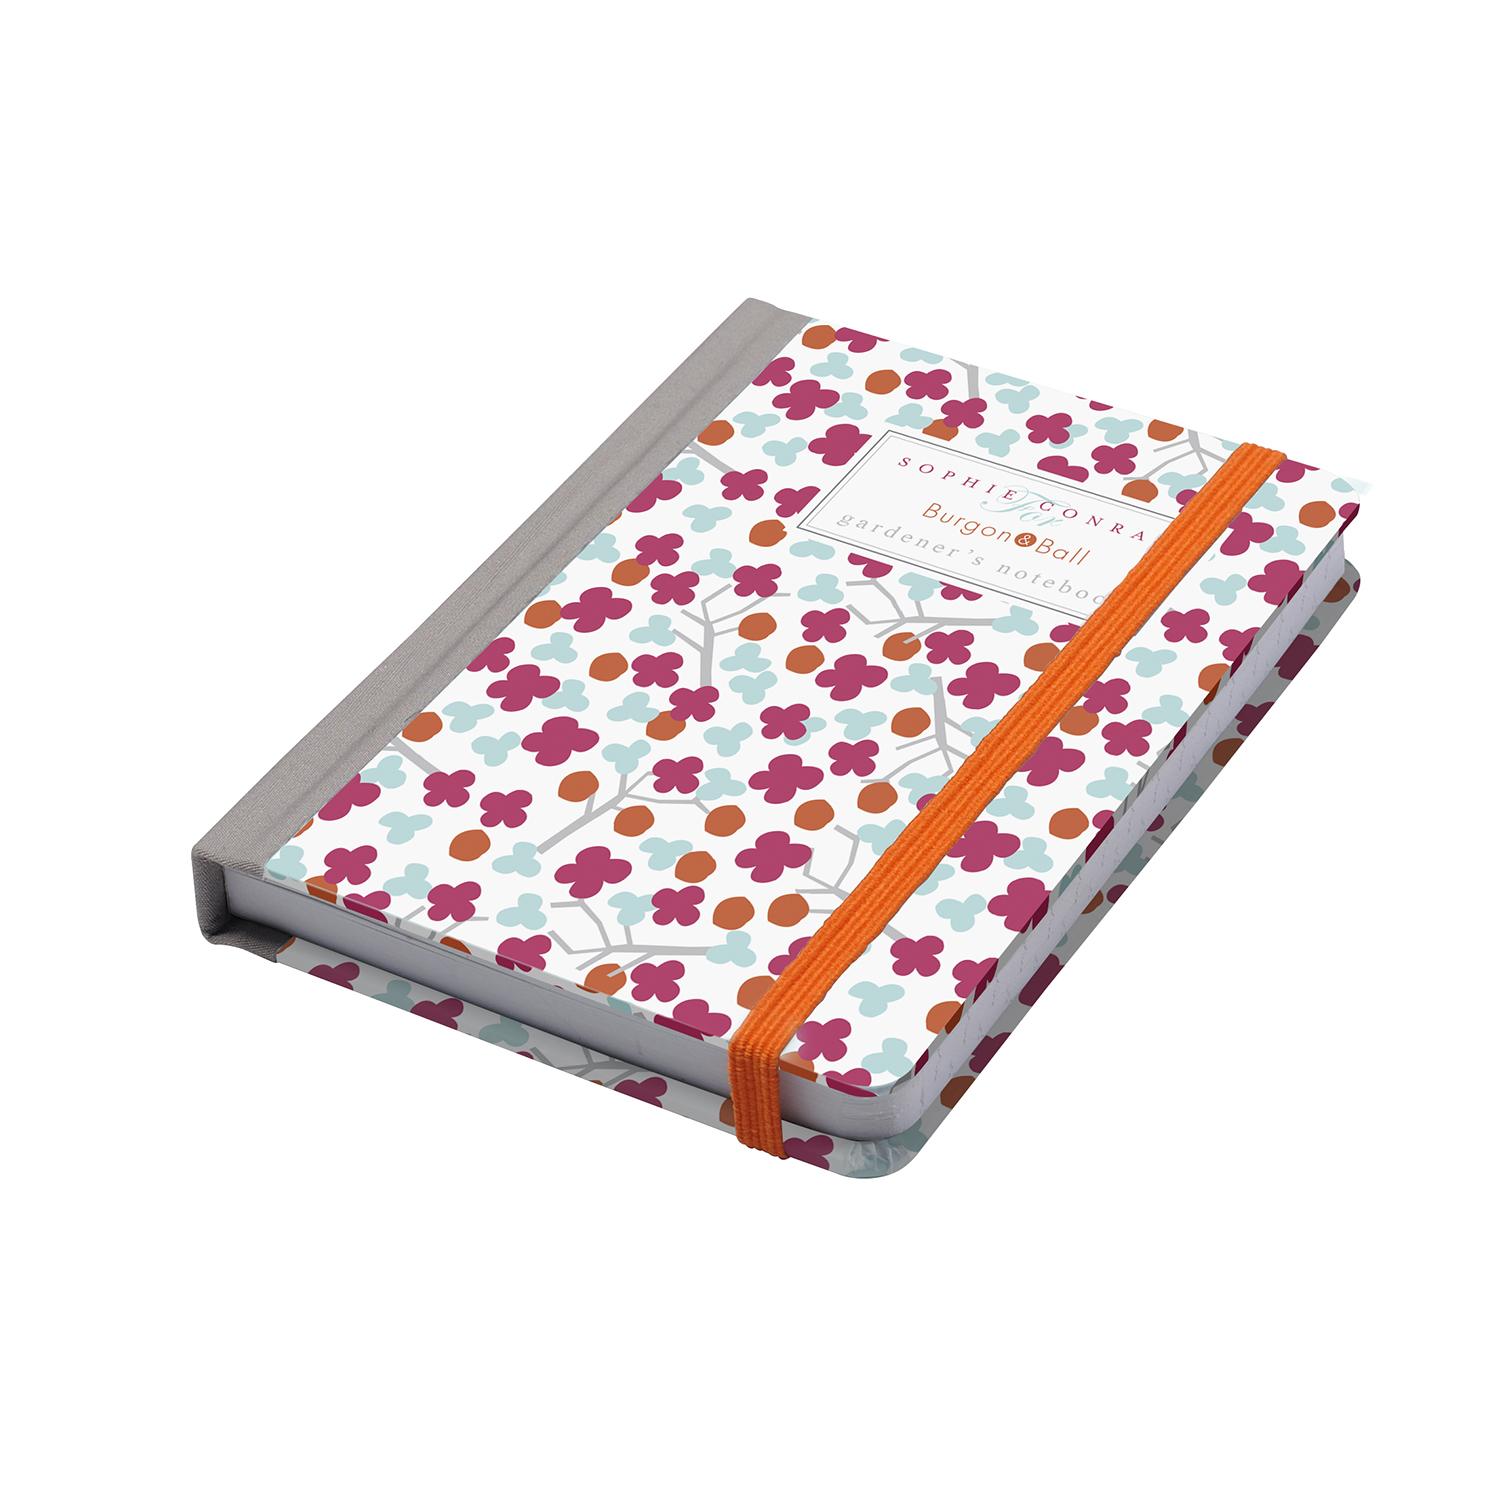 Burgon & Ball – Sophie Conran Gardener's A6 Notebook in Cherry